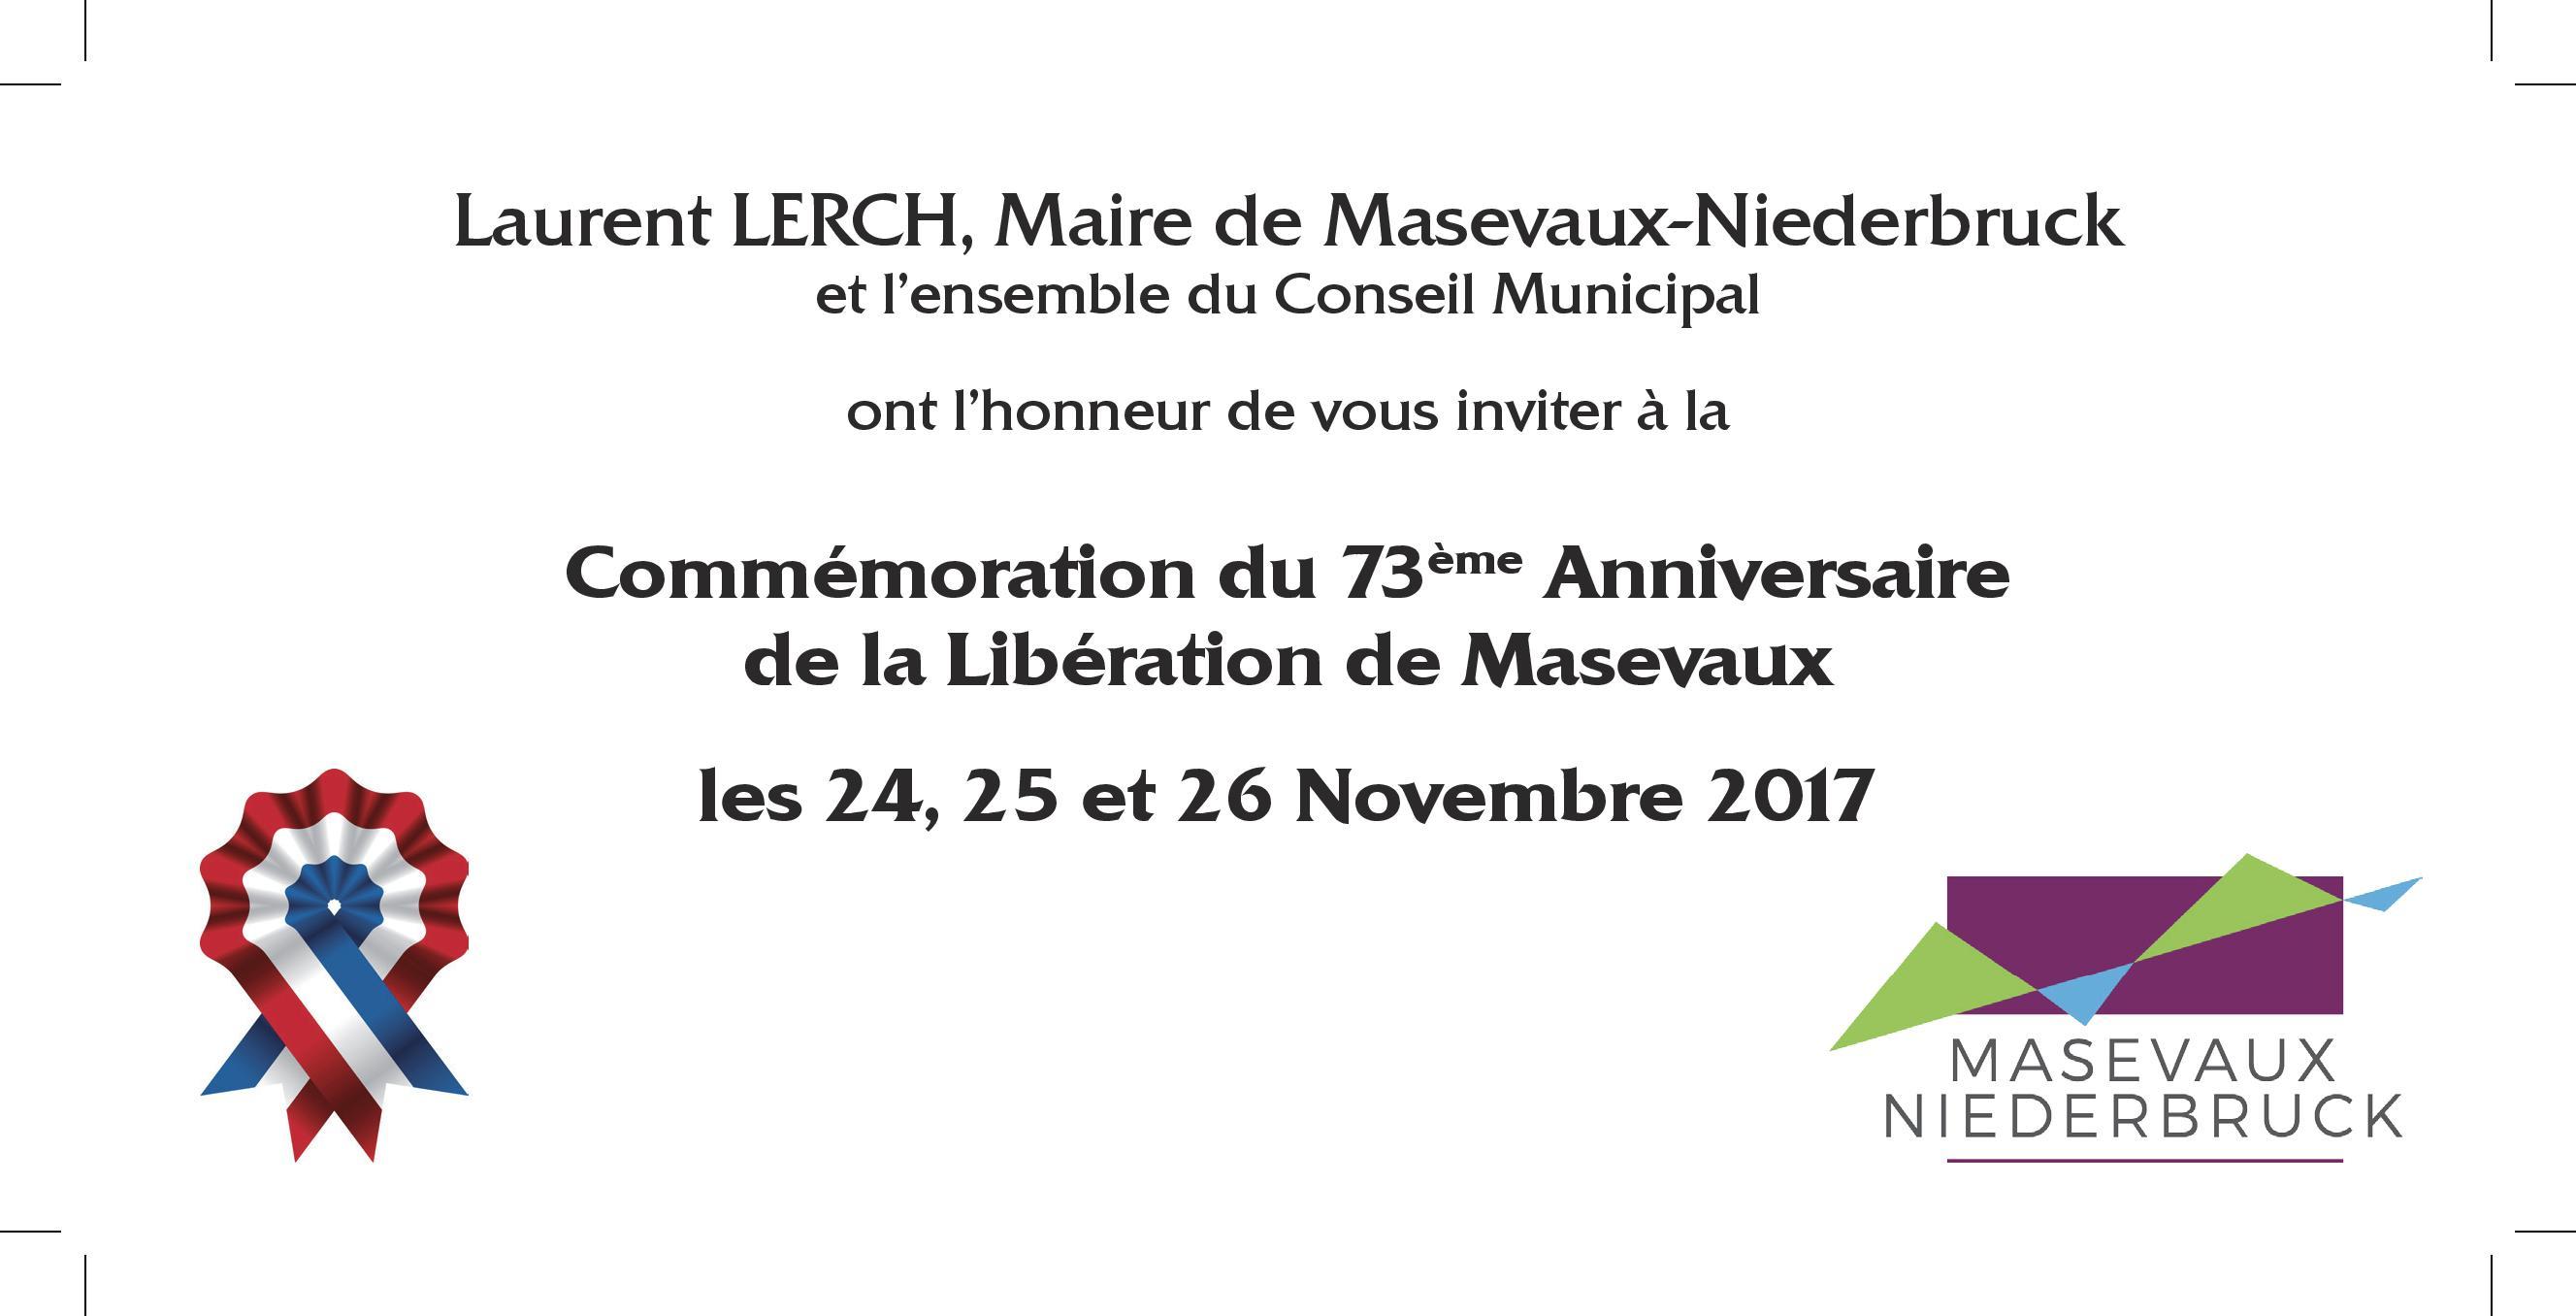 Invit Libération MX 2017-page-001